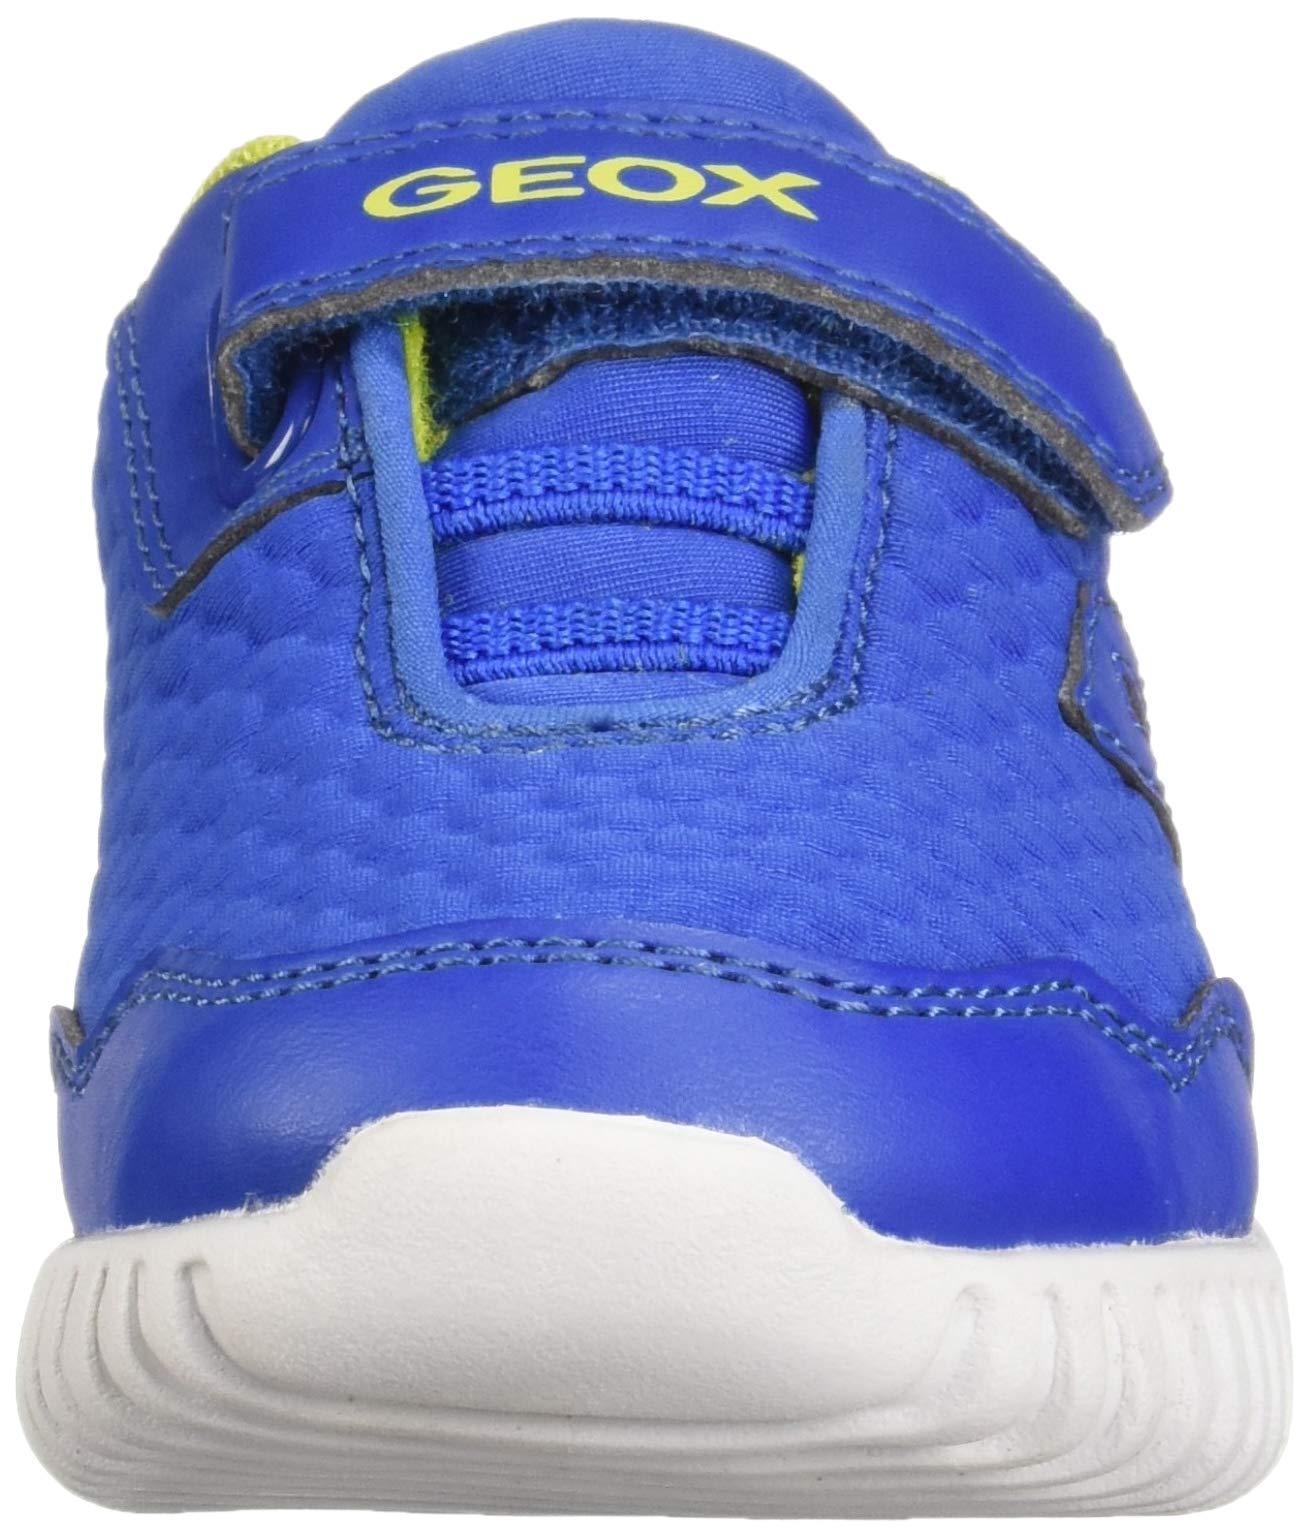 Geox B Waviness B, Scarpe da Ginnastica Basse Bimbo